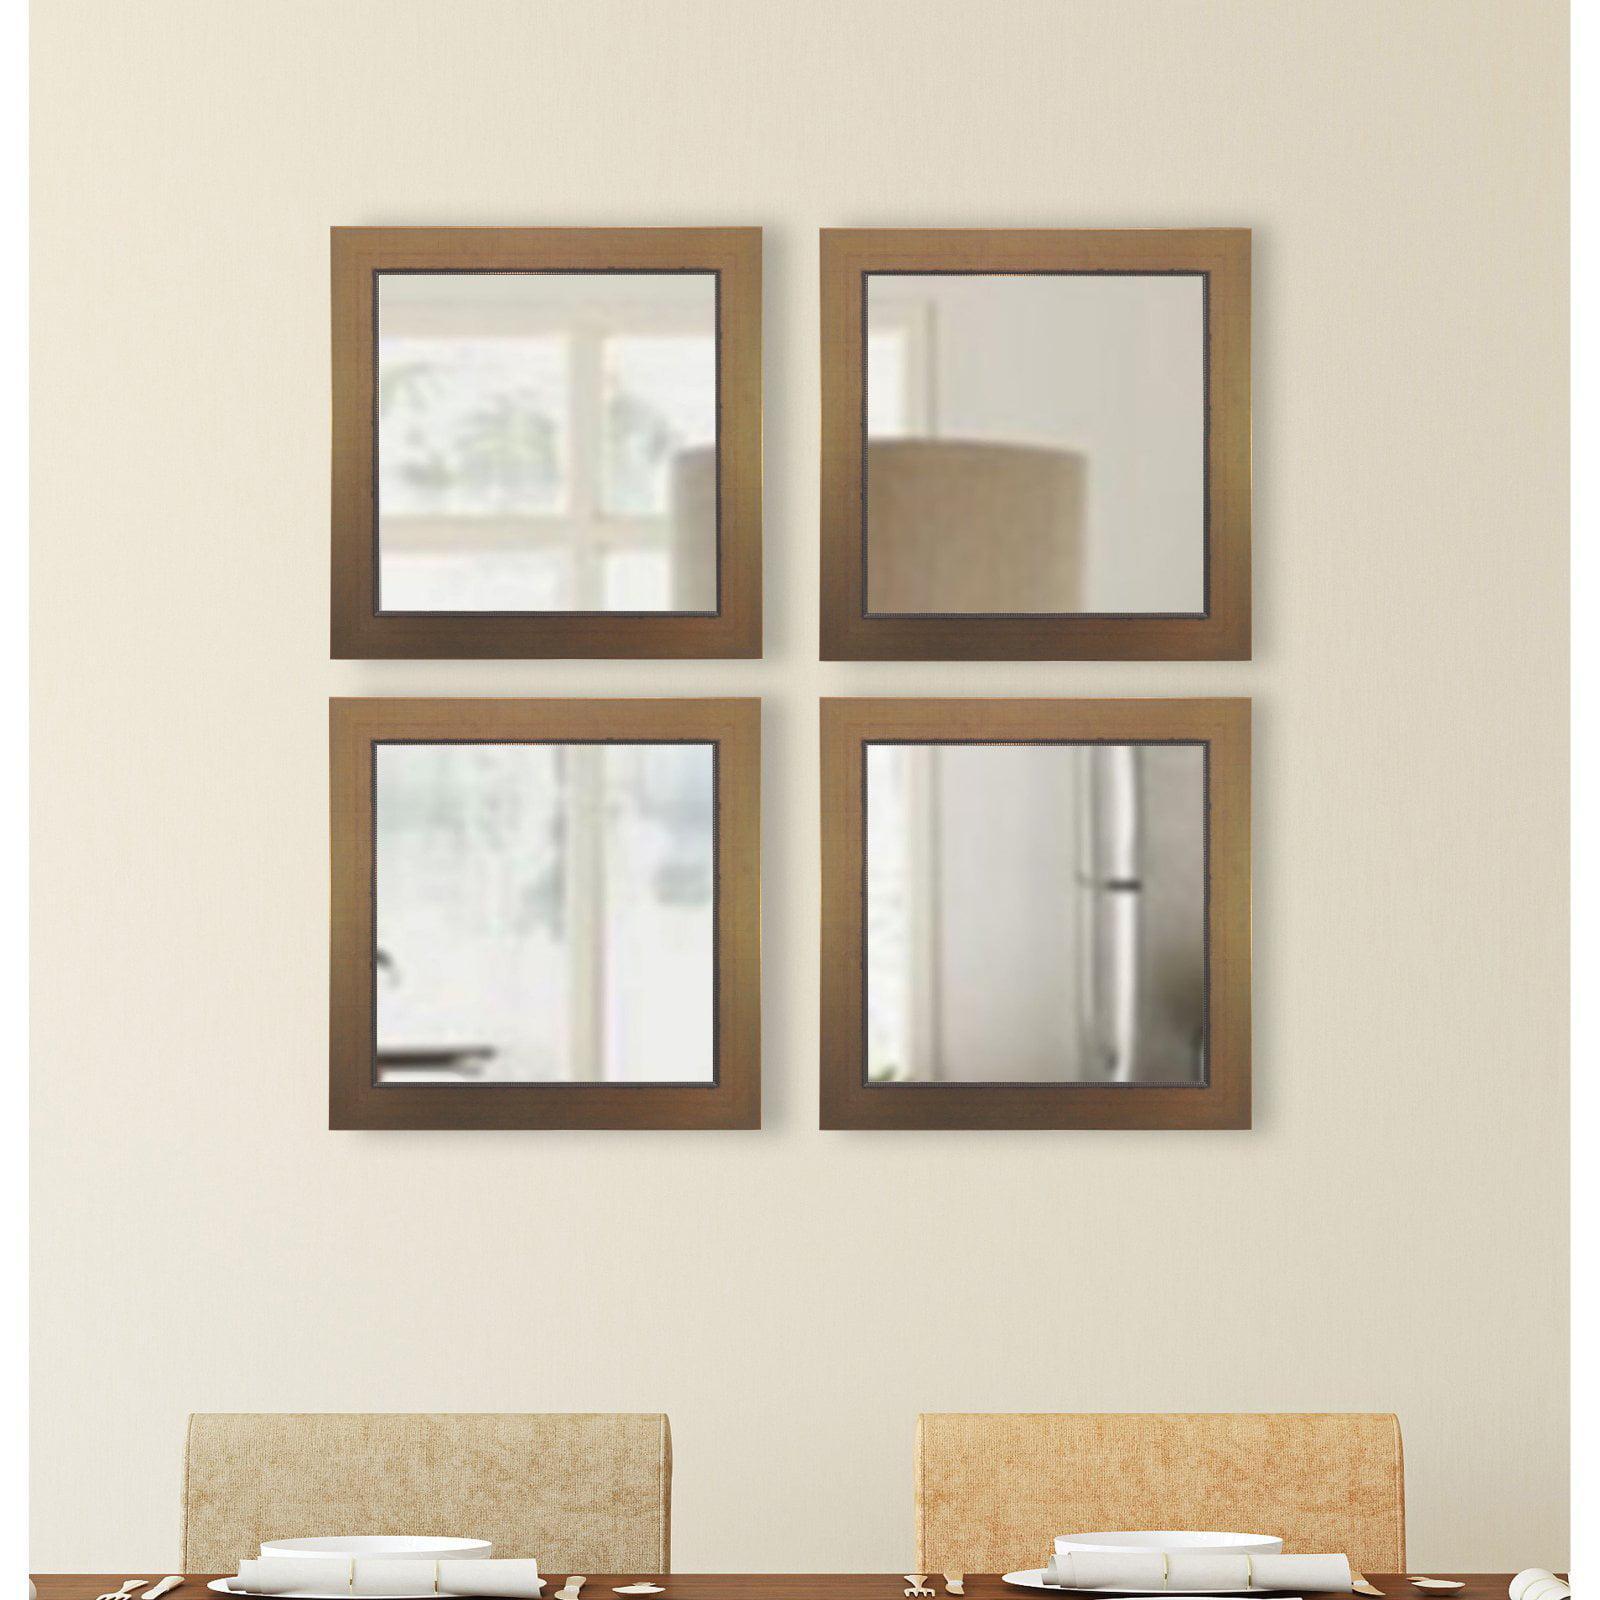 Rayne Mirrors Lowe Square Wall Mirror - Set of 4